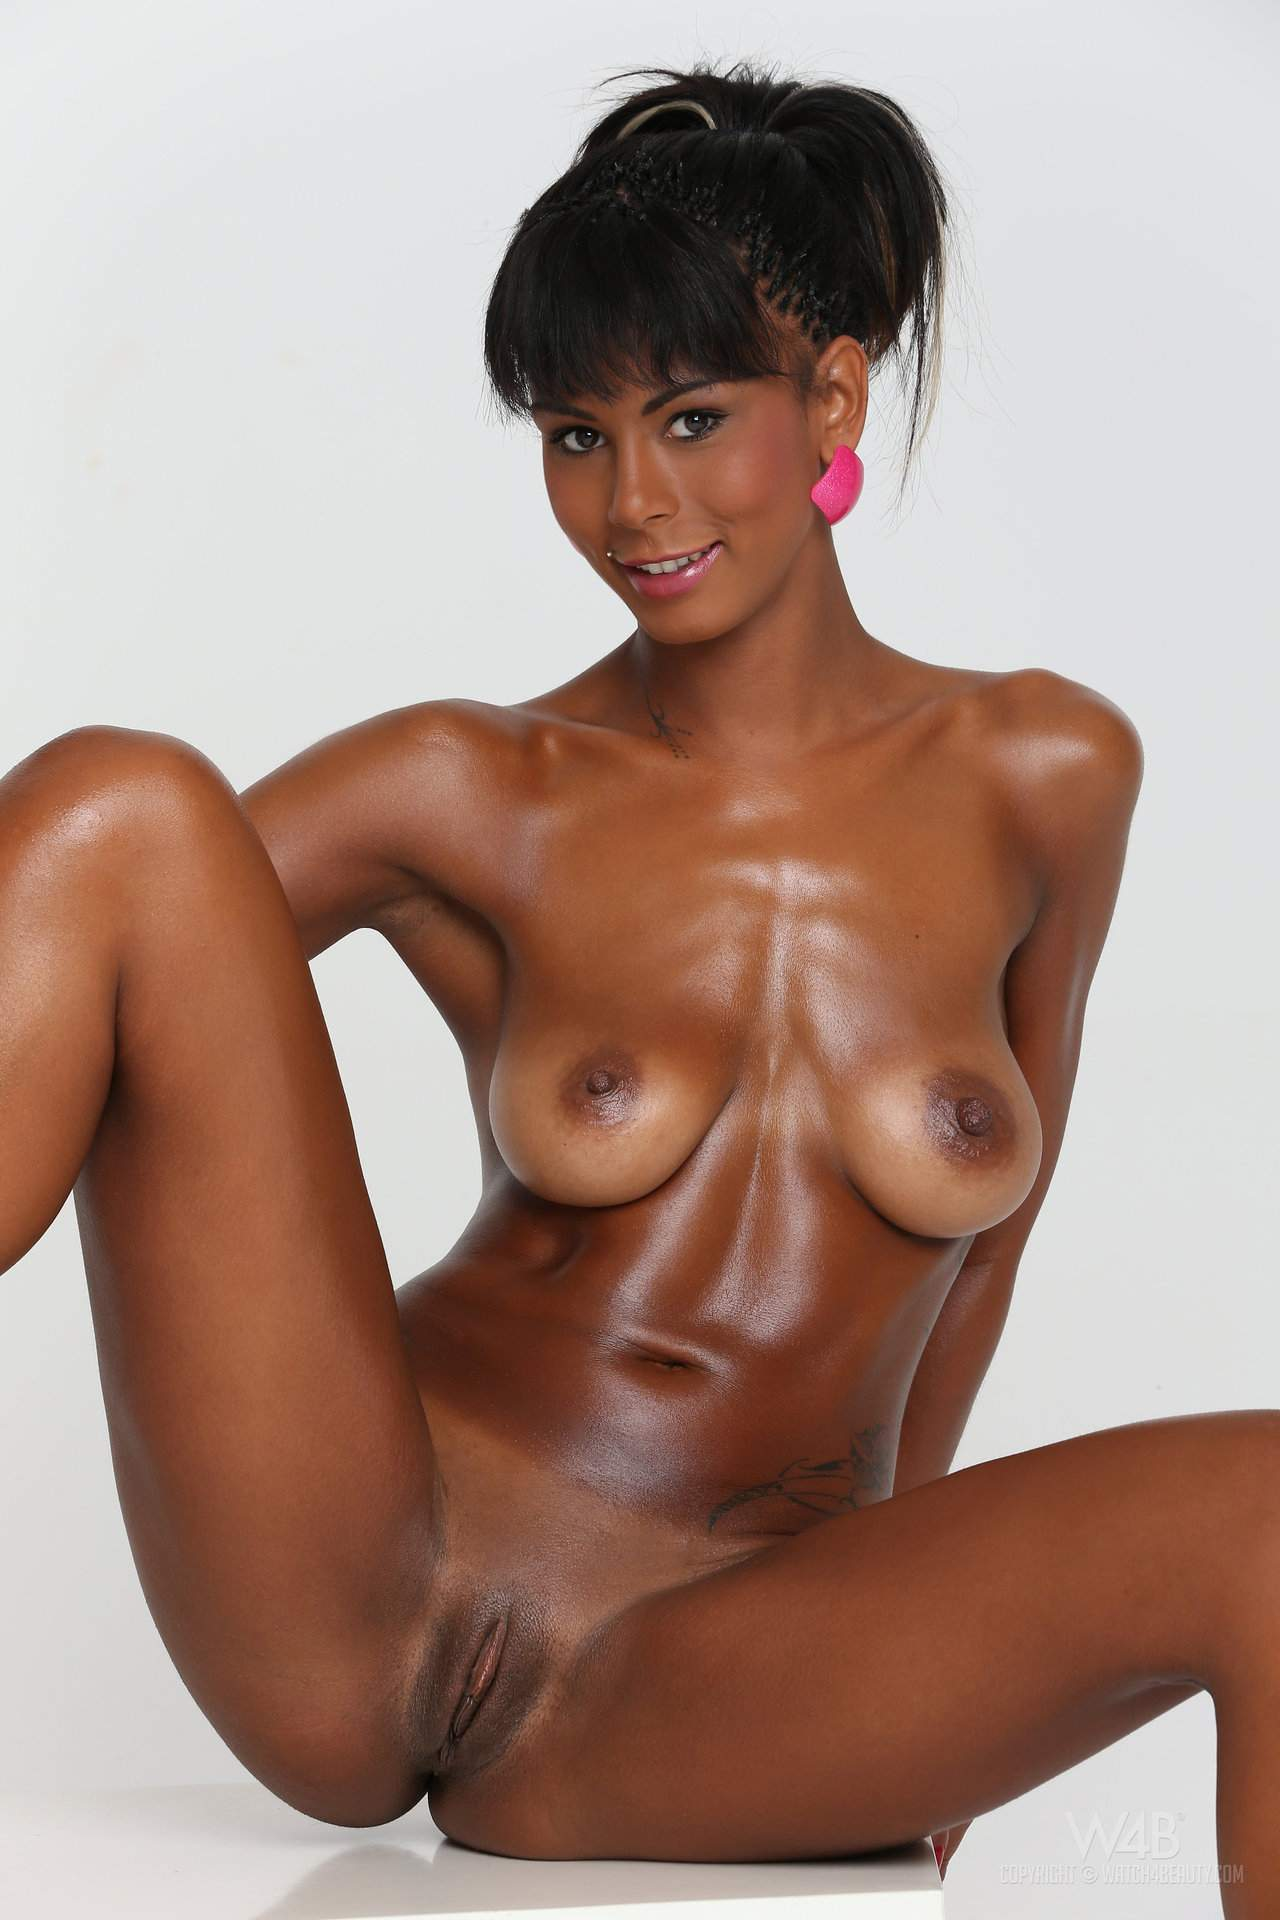 nakenbading jenter bilder isabella martinsen nude